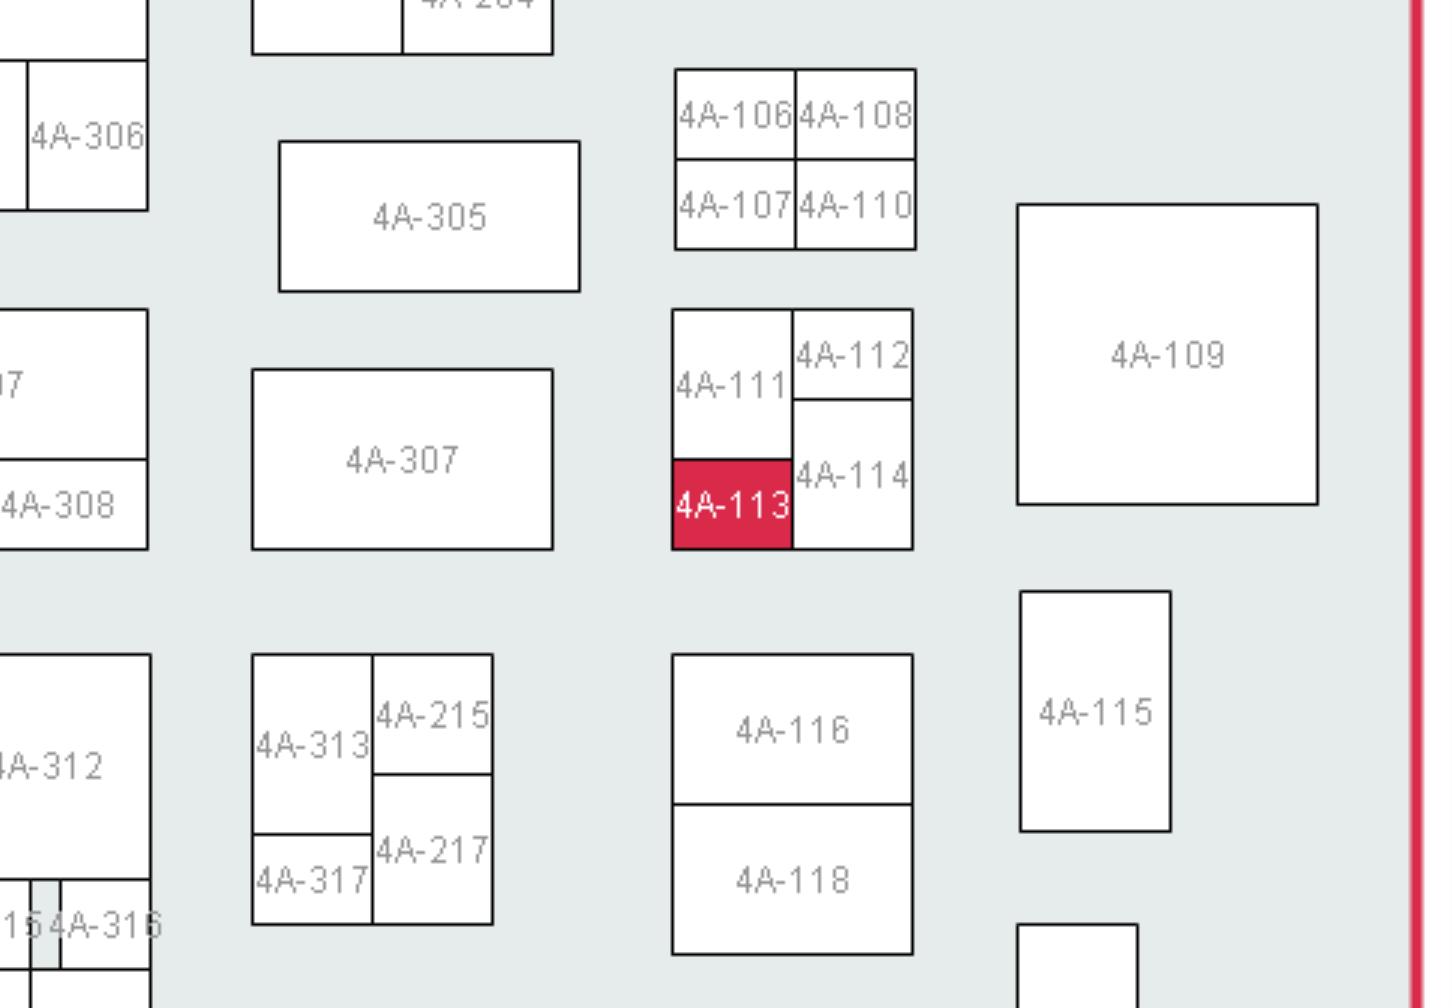 4A / 4A-113